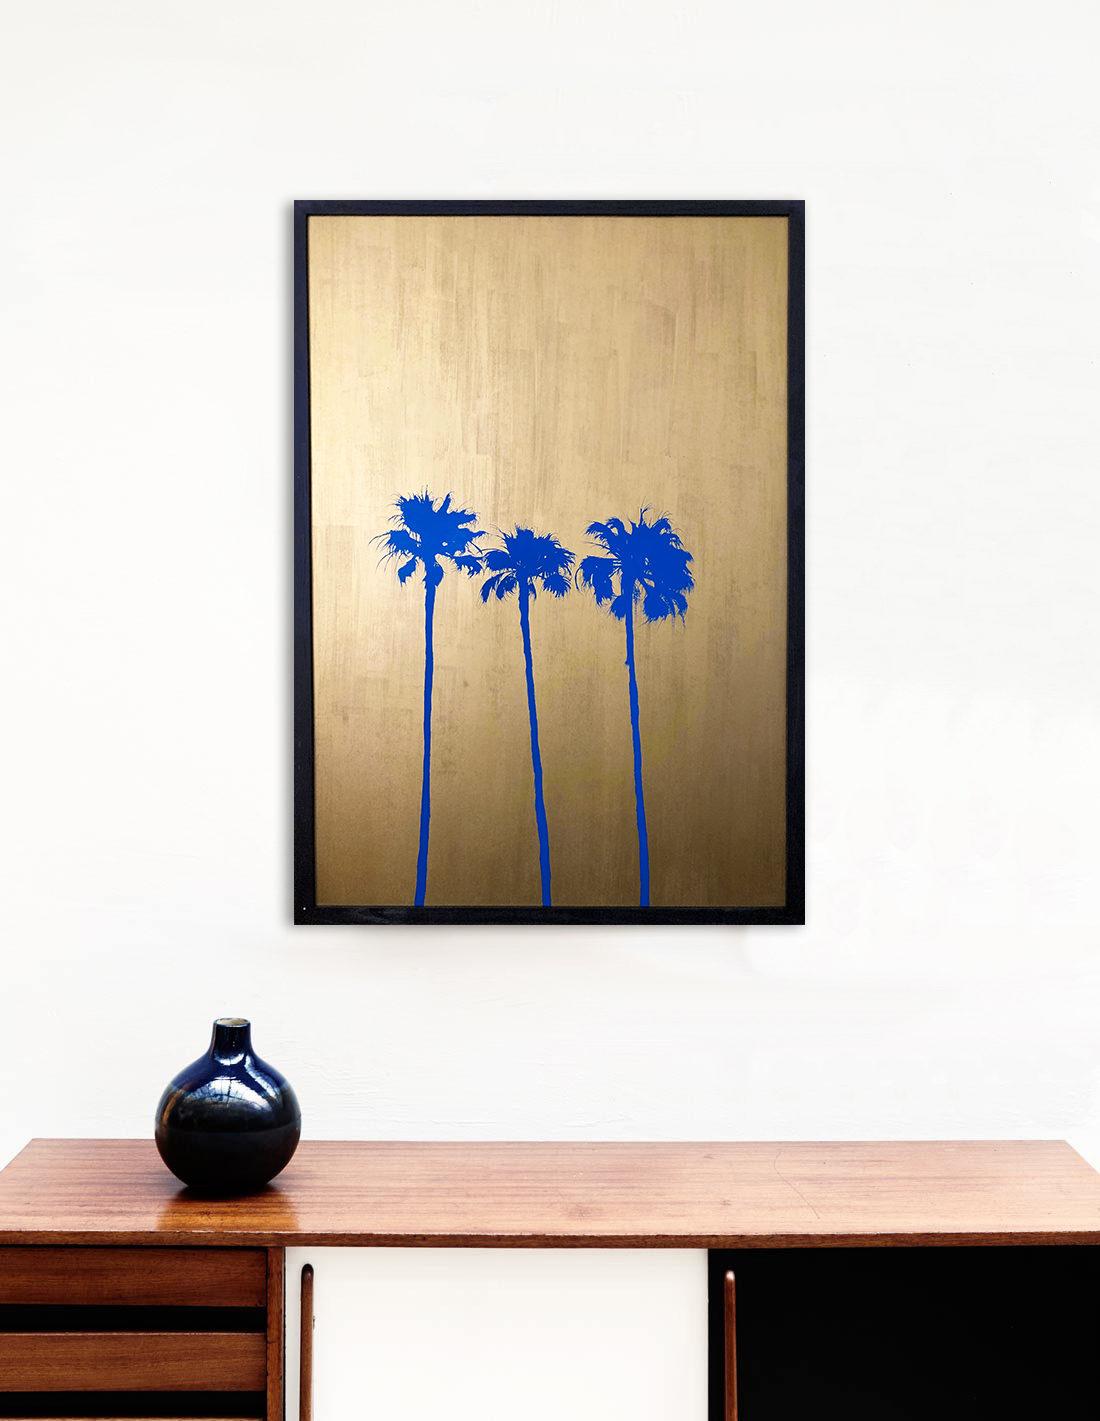 Giant palmtrees III bleu- Tableau- Hubert Jouzeau